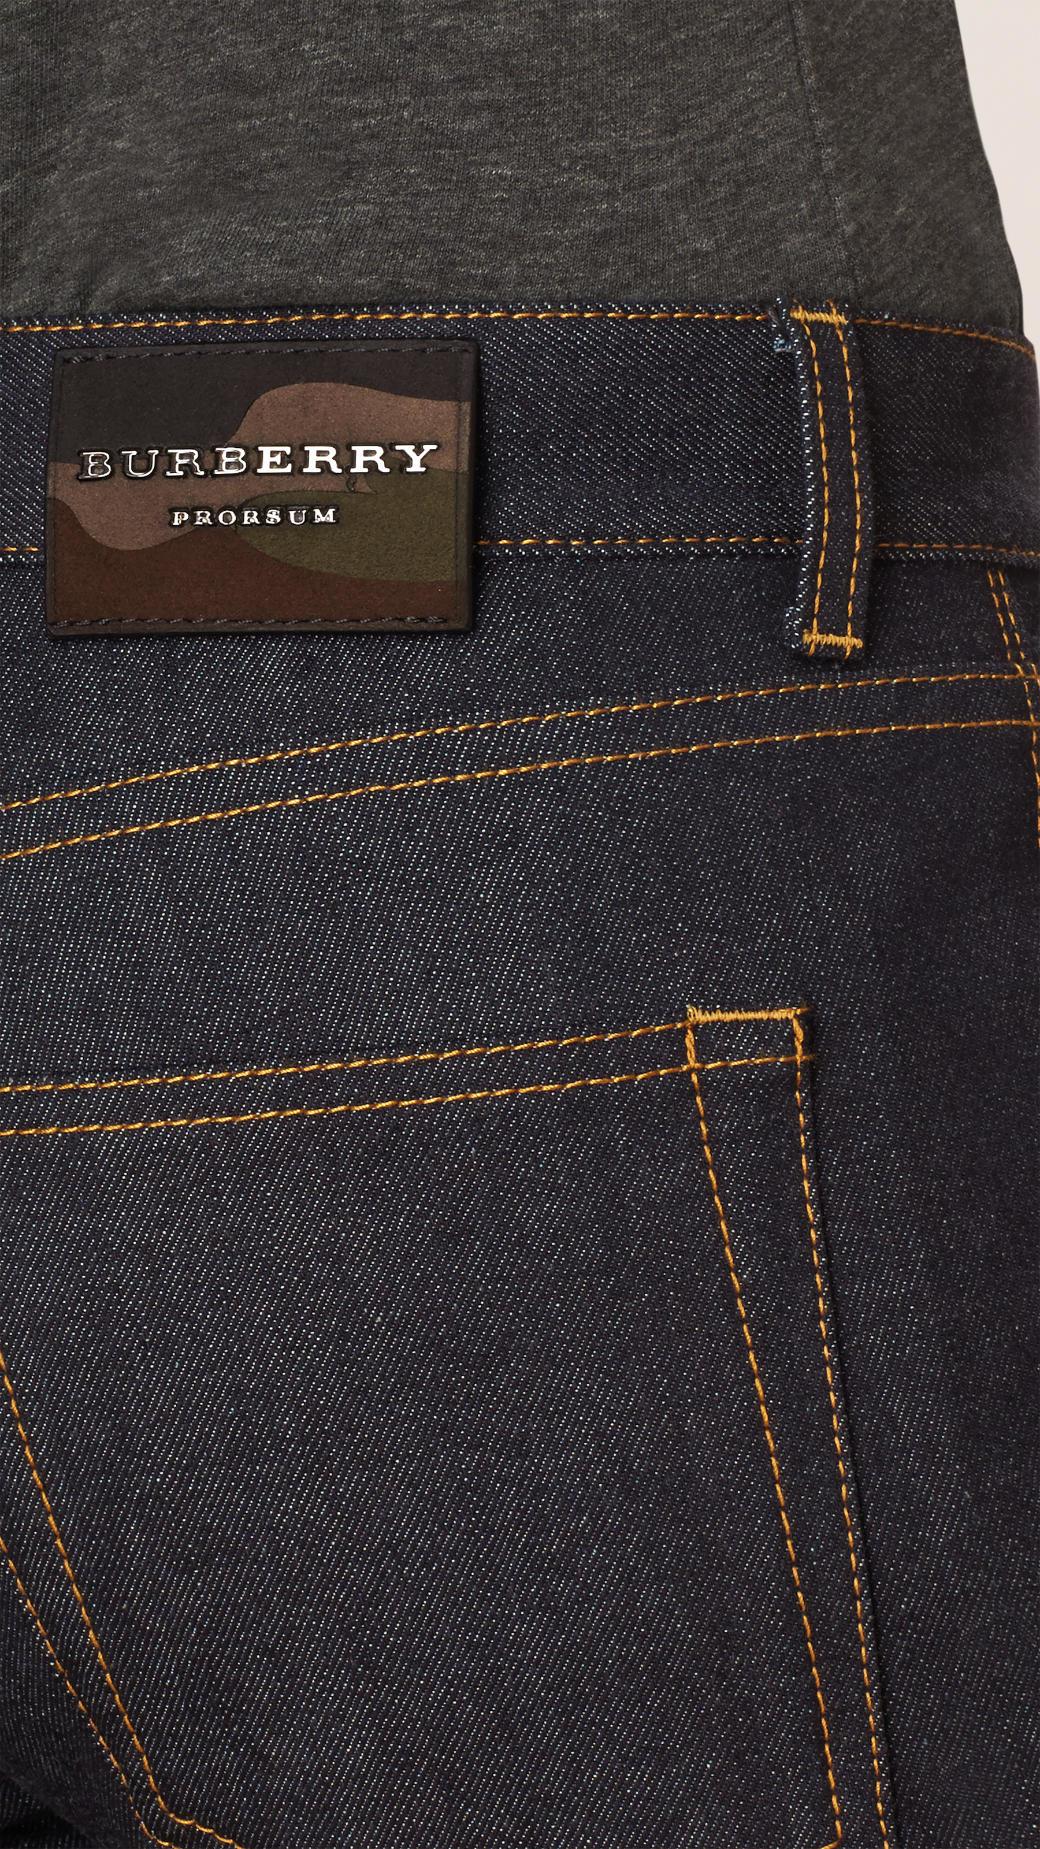 Burberry Slim Fit Japanese Selvedge Jeans in Indigo (Blue) for Men